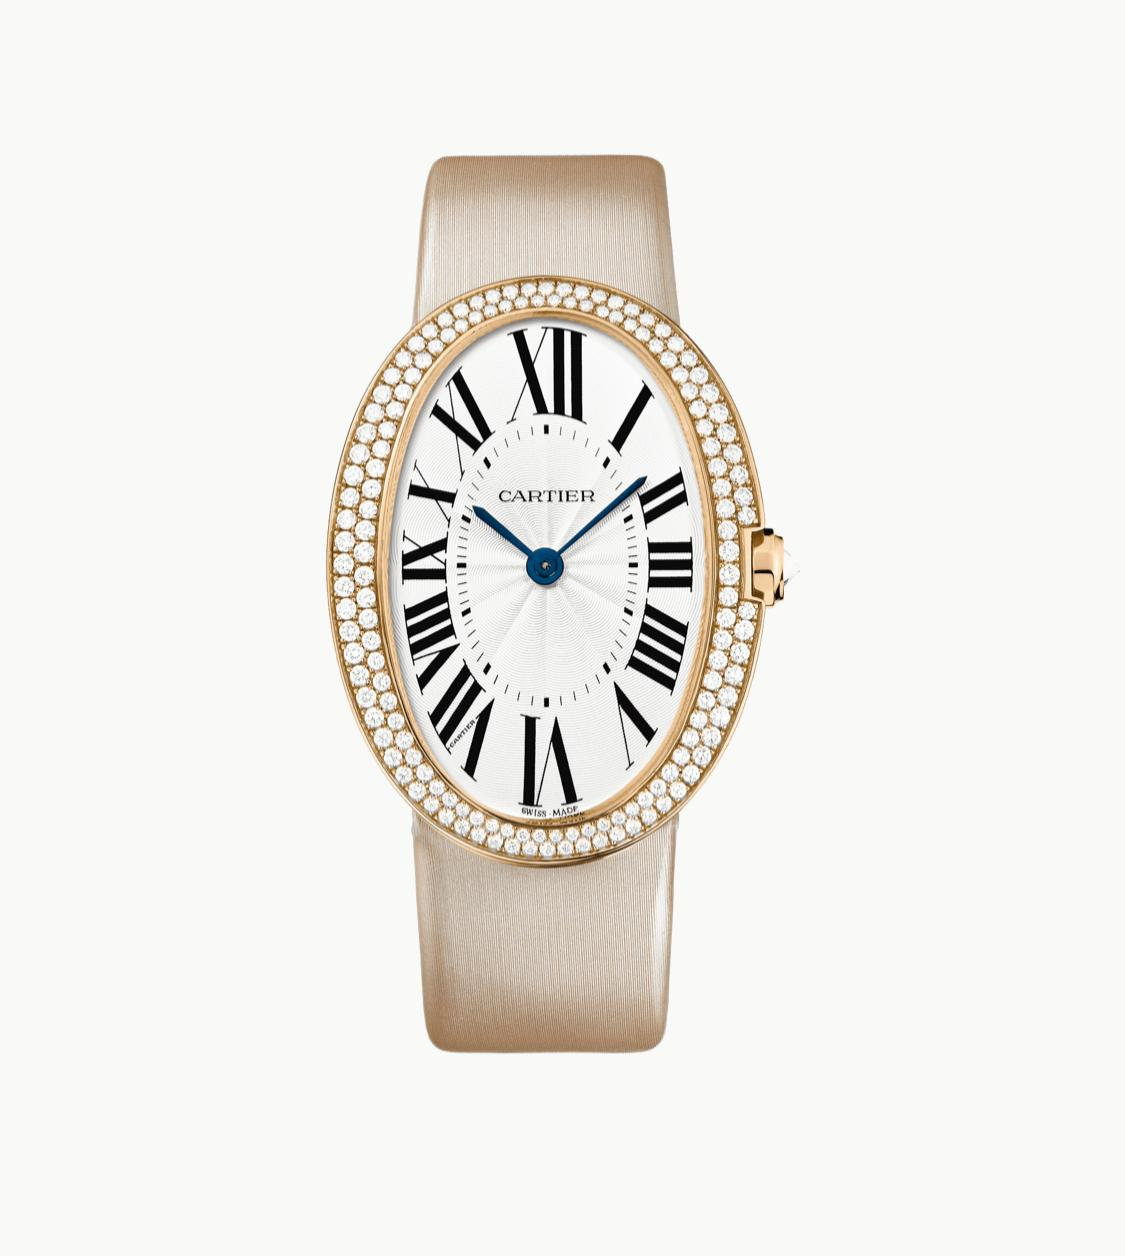 ساعة بينوار دو كارتييه Cartier